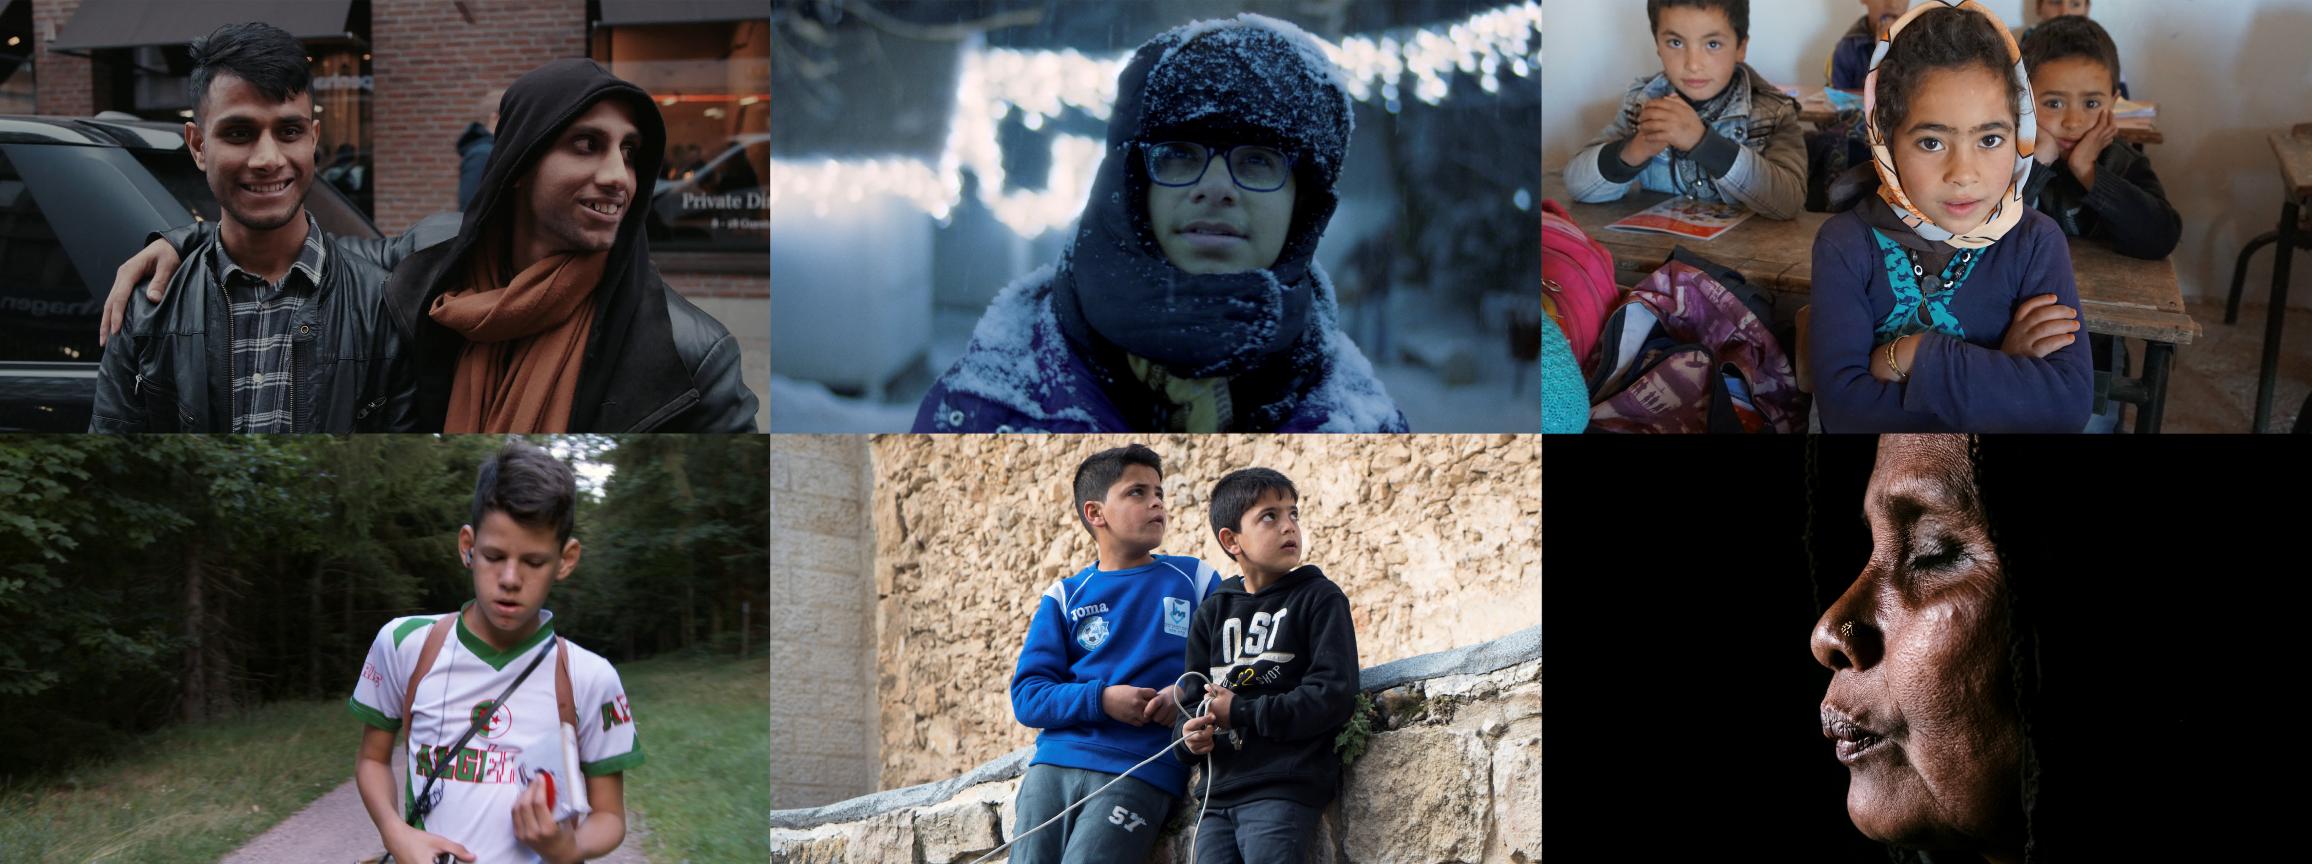 Nominees DOK.fest Award of SOS-Kinderdörfer weltweit